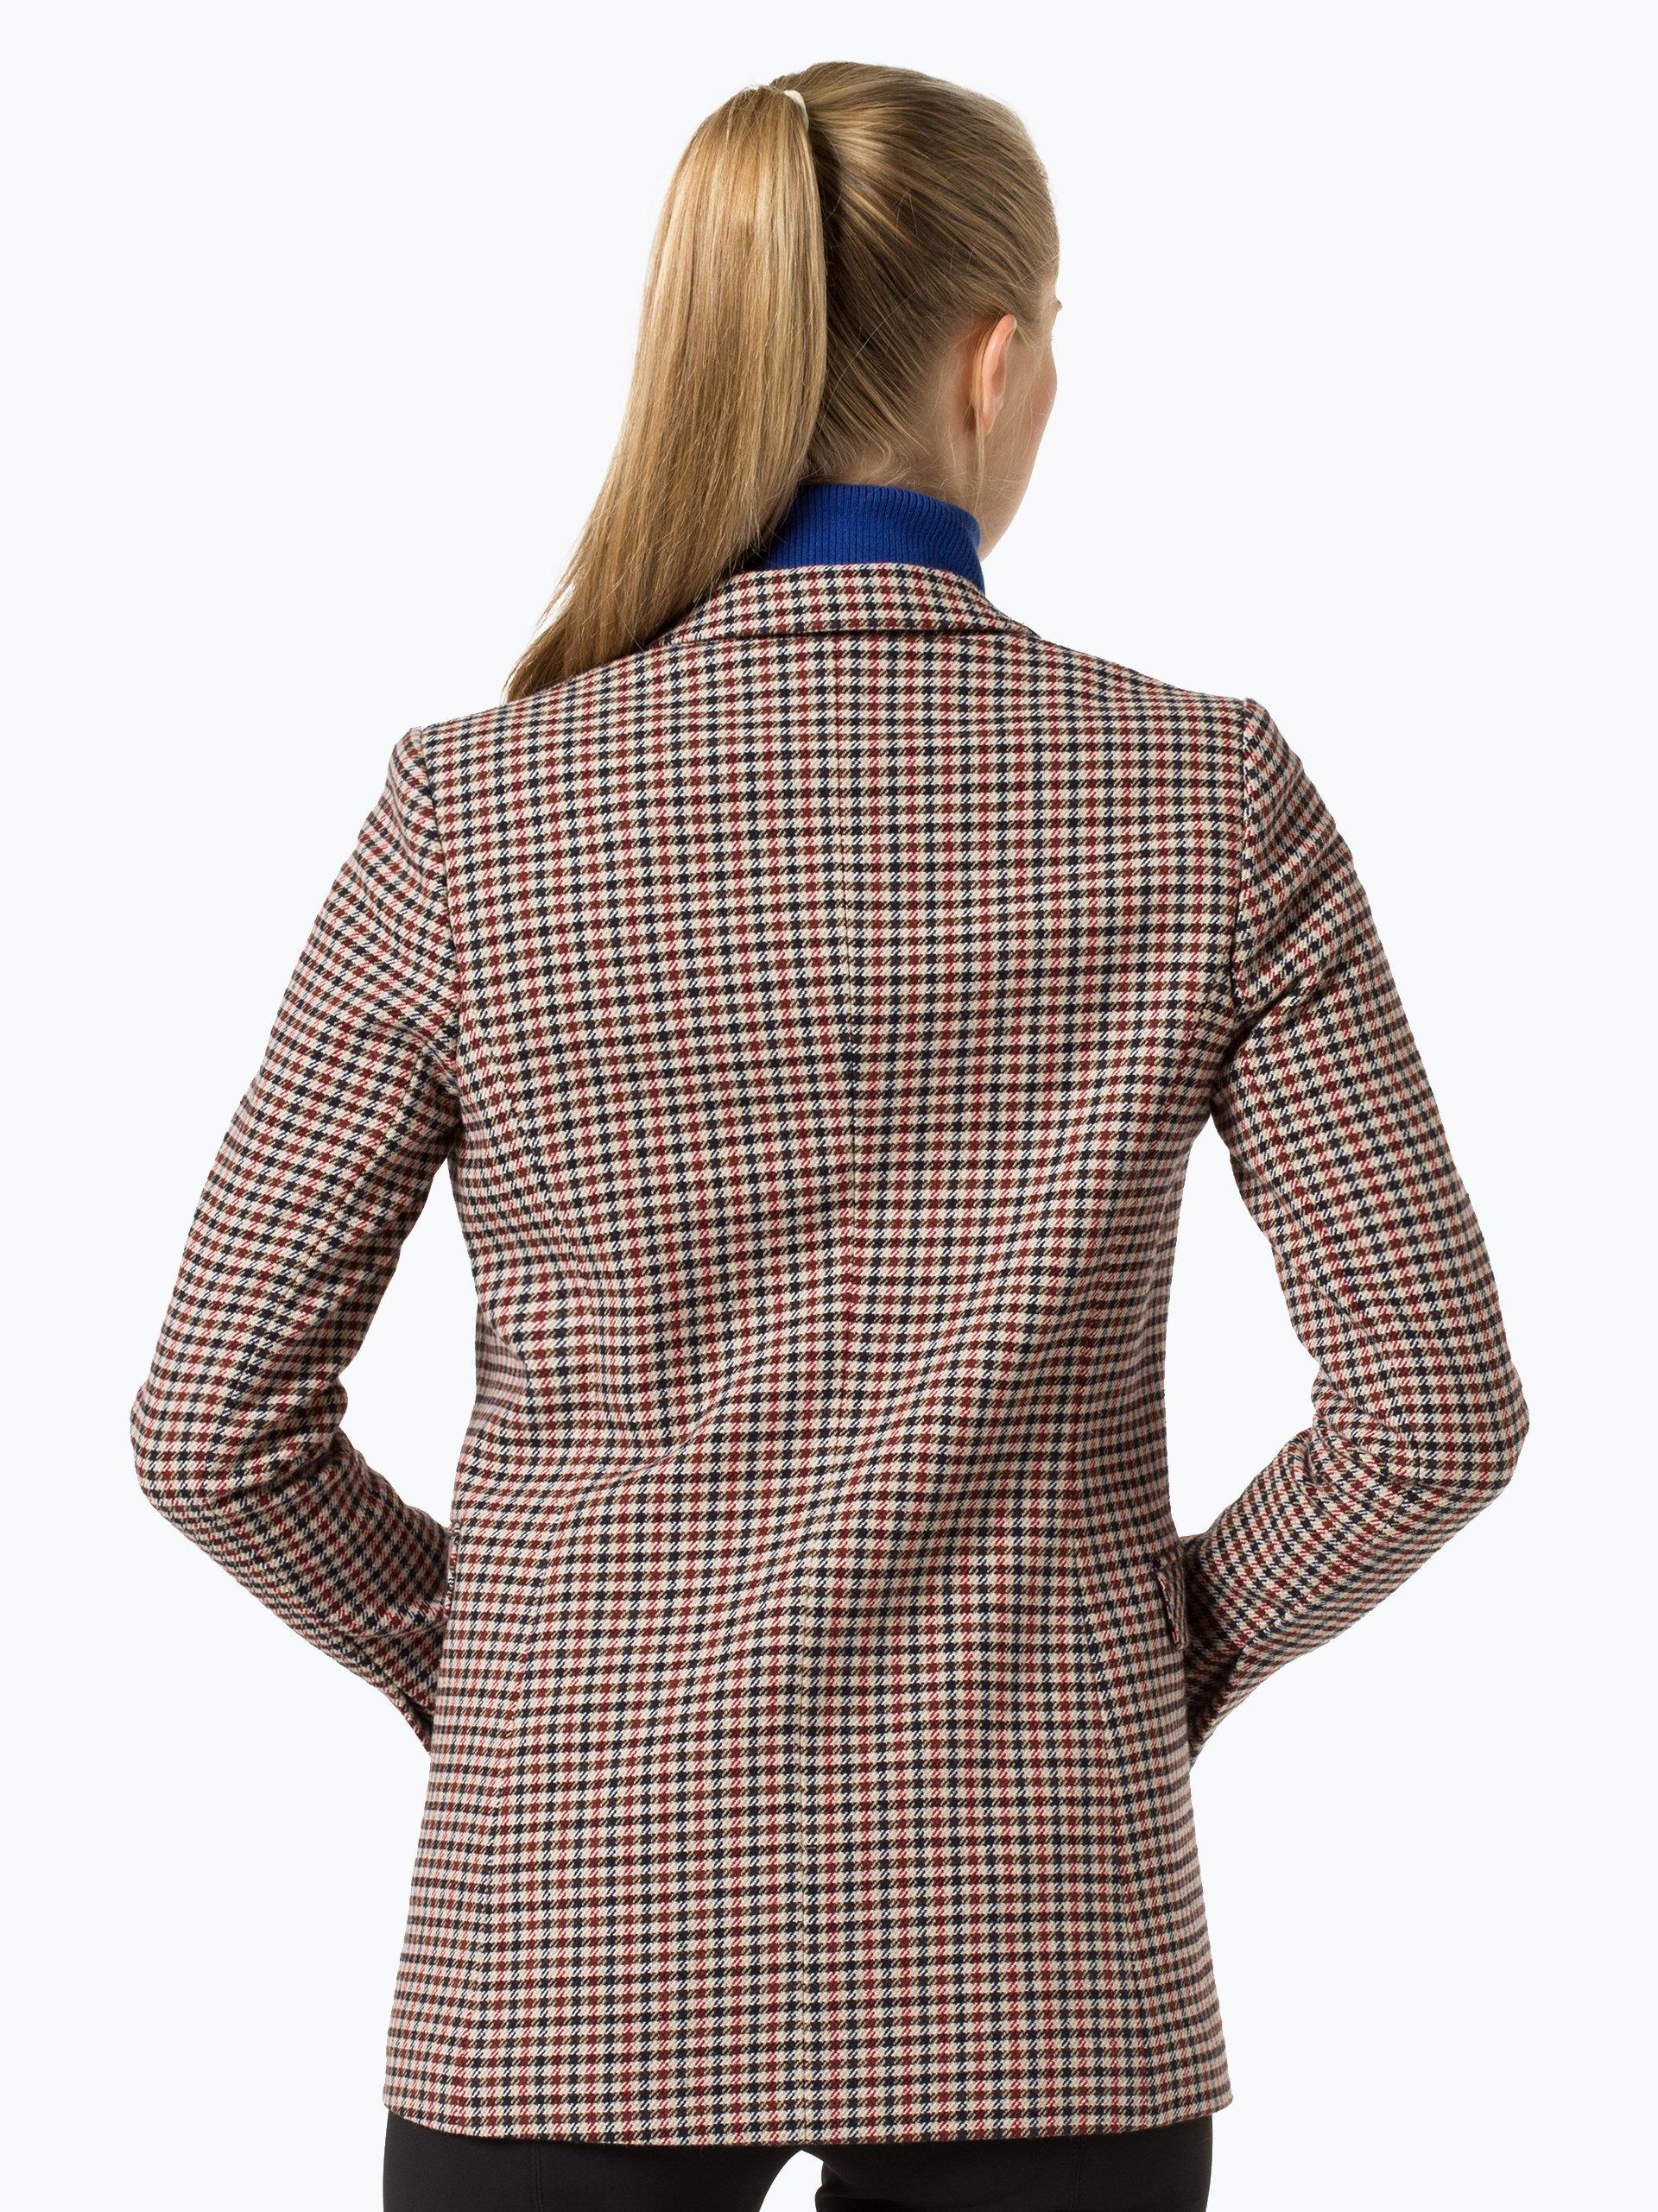 marie lund damen blazer coordinates rot kariert online kaufen vangraaf com. Black Bedroom Furniture Sets. Home Design Ideas